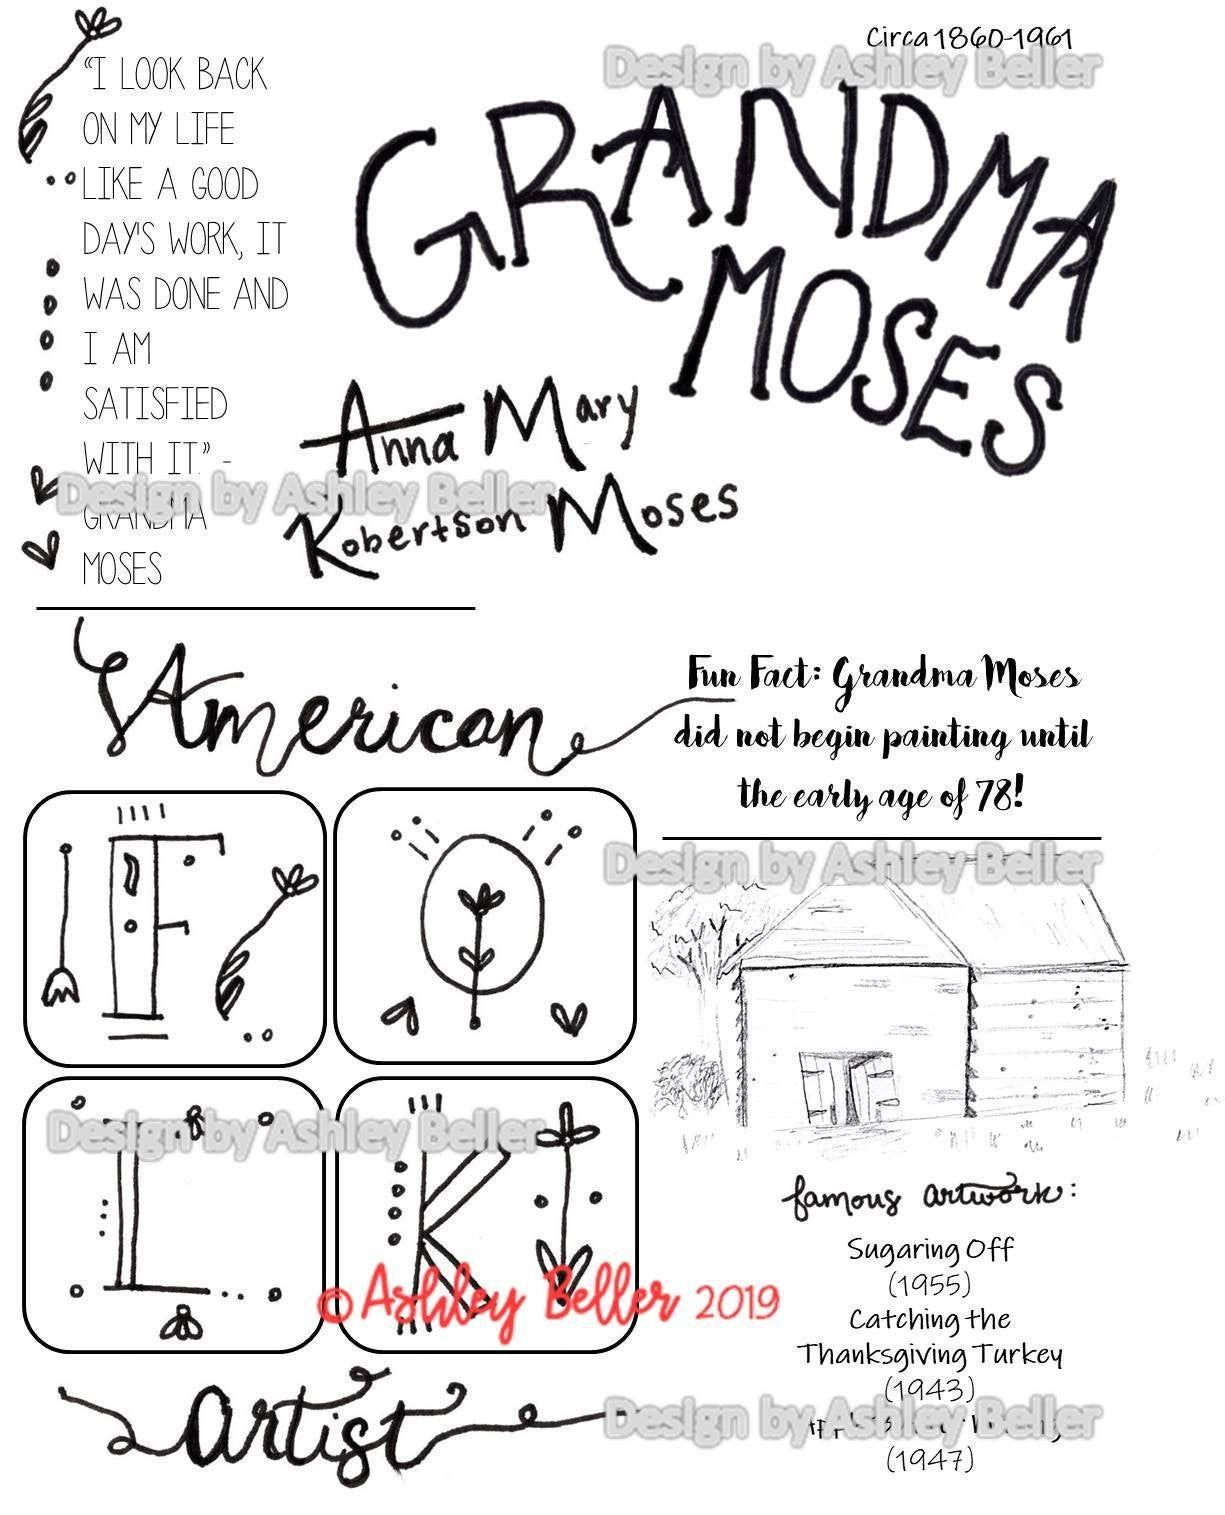 Grandma Moses Great Artist Color Sheet Cycle 3 Grandma